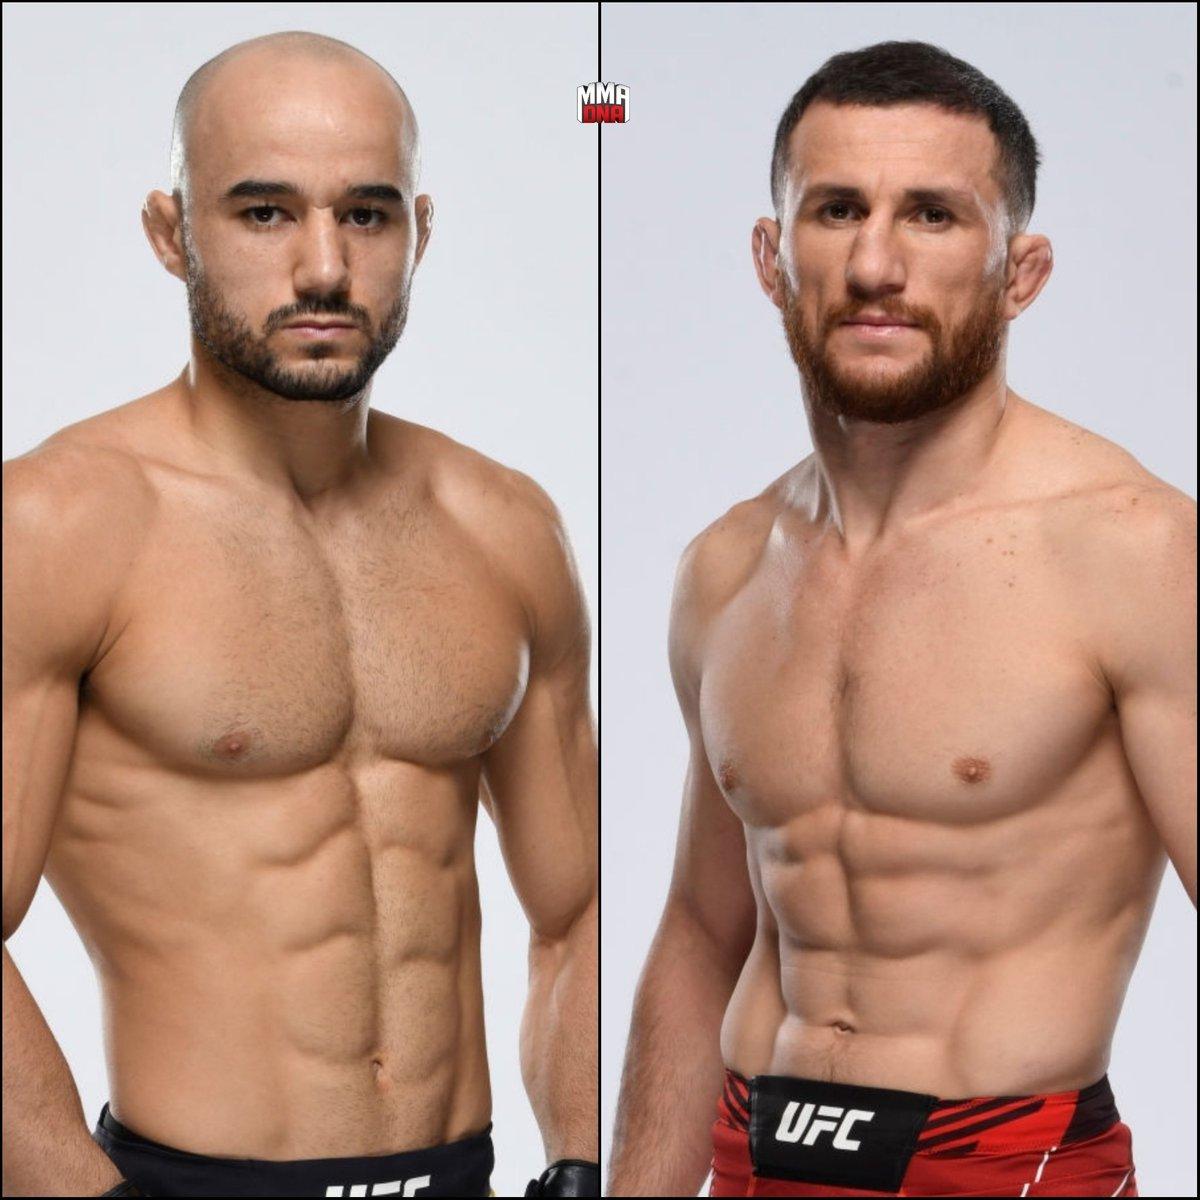 Marlon Moraes will fight Merab Dvalishvili at #UFC266 on September 25th. (per @raylongomma on @AnikFlorianPod) #UFC #MMA #UFCESPN https://t.co/9UO0UGyj6G